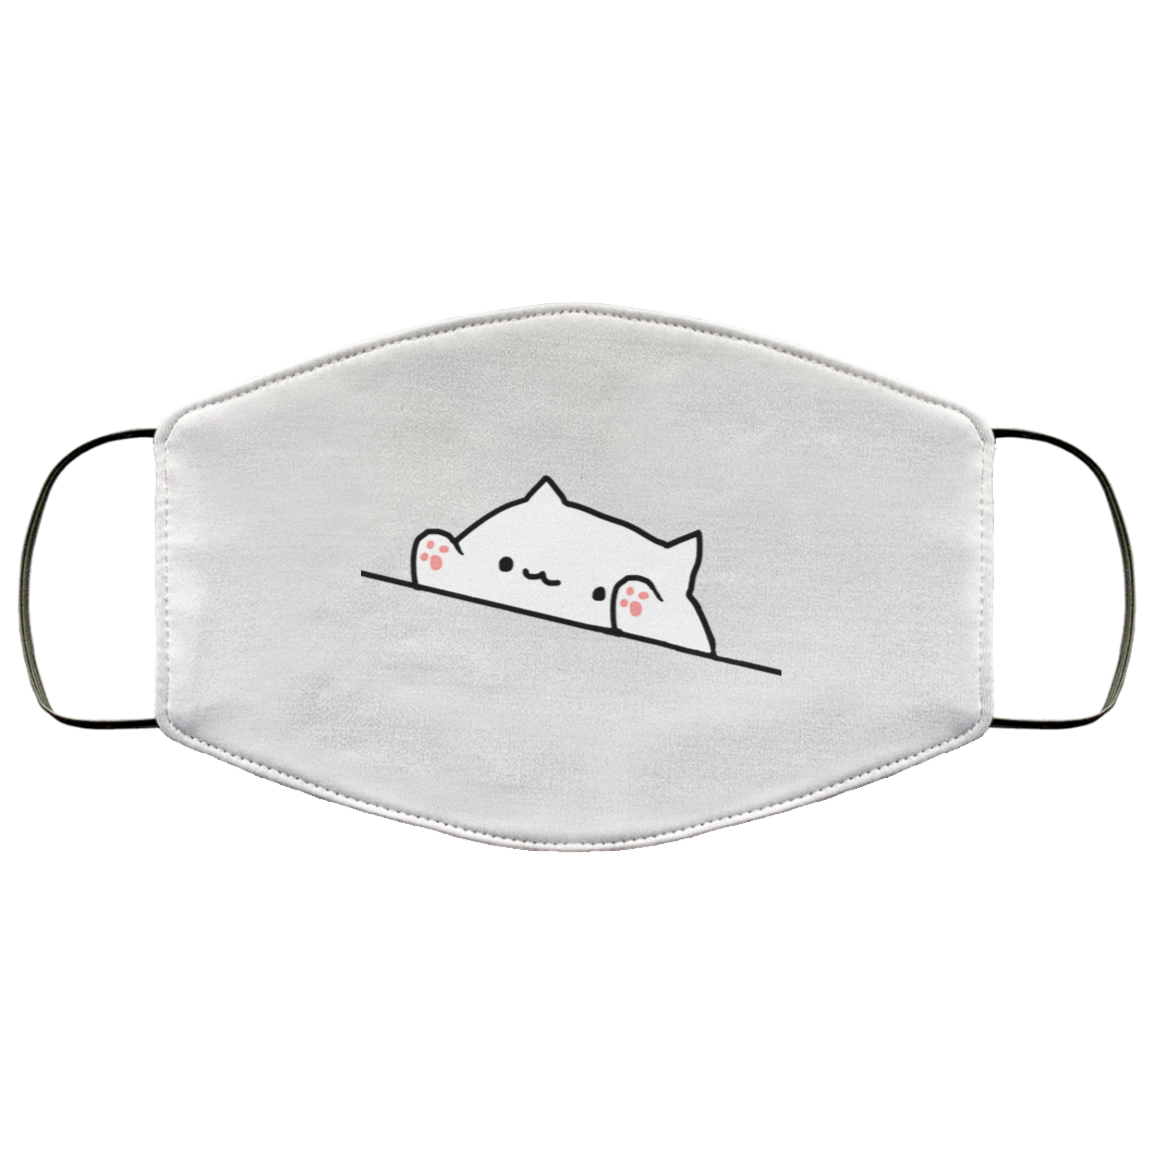 Bongo Cat Reusable Face Maskbongo Cat Reusable Face Mask Return Amp Warranty 100 Secure Payment With Ssl Encryption If You 039 Re Not Face Mask Bongo Mask